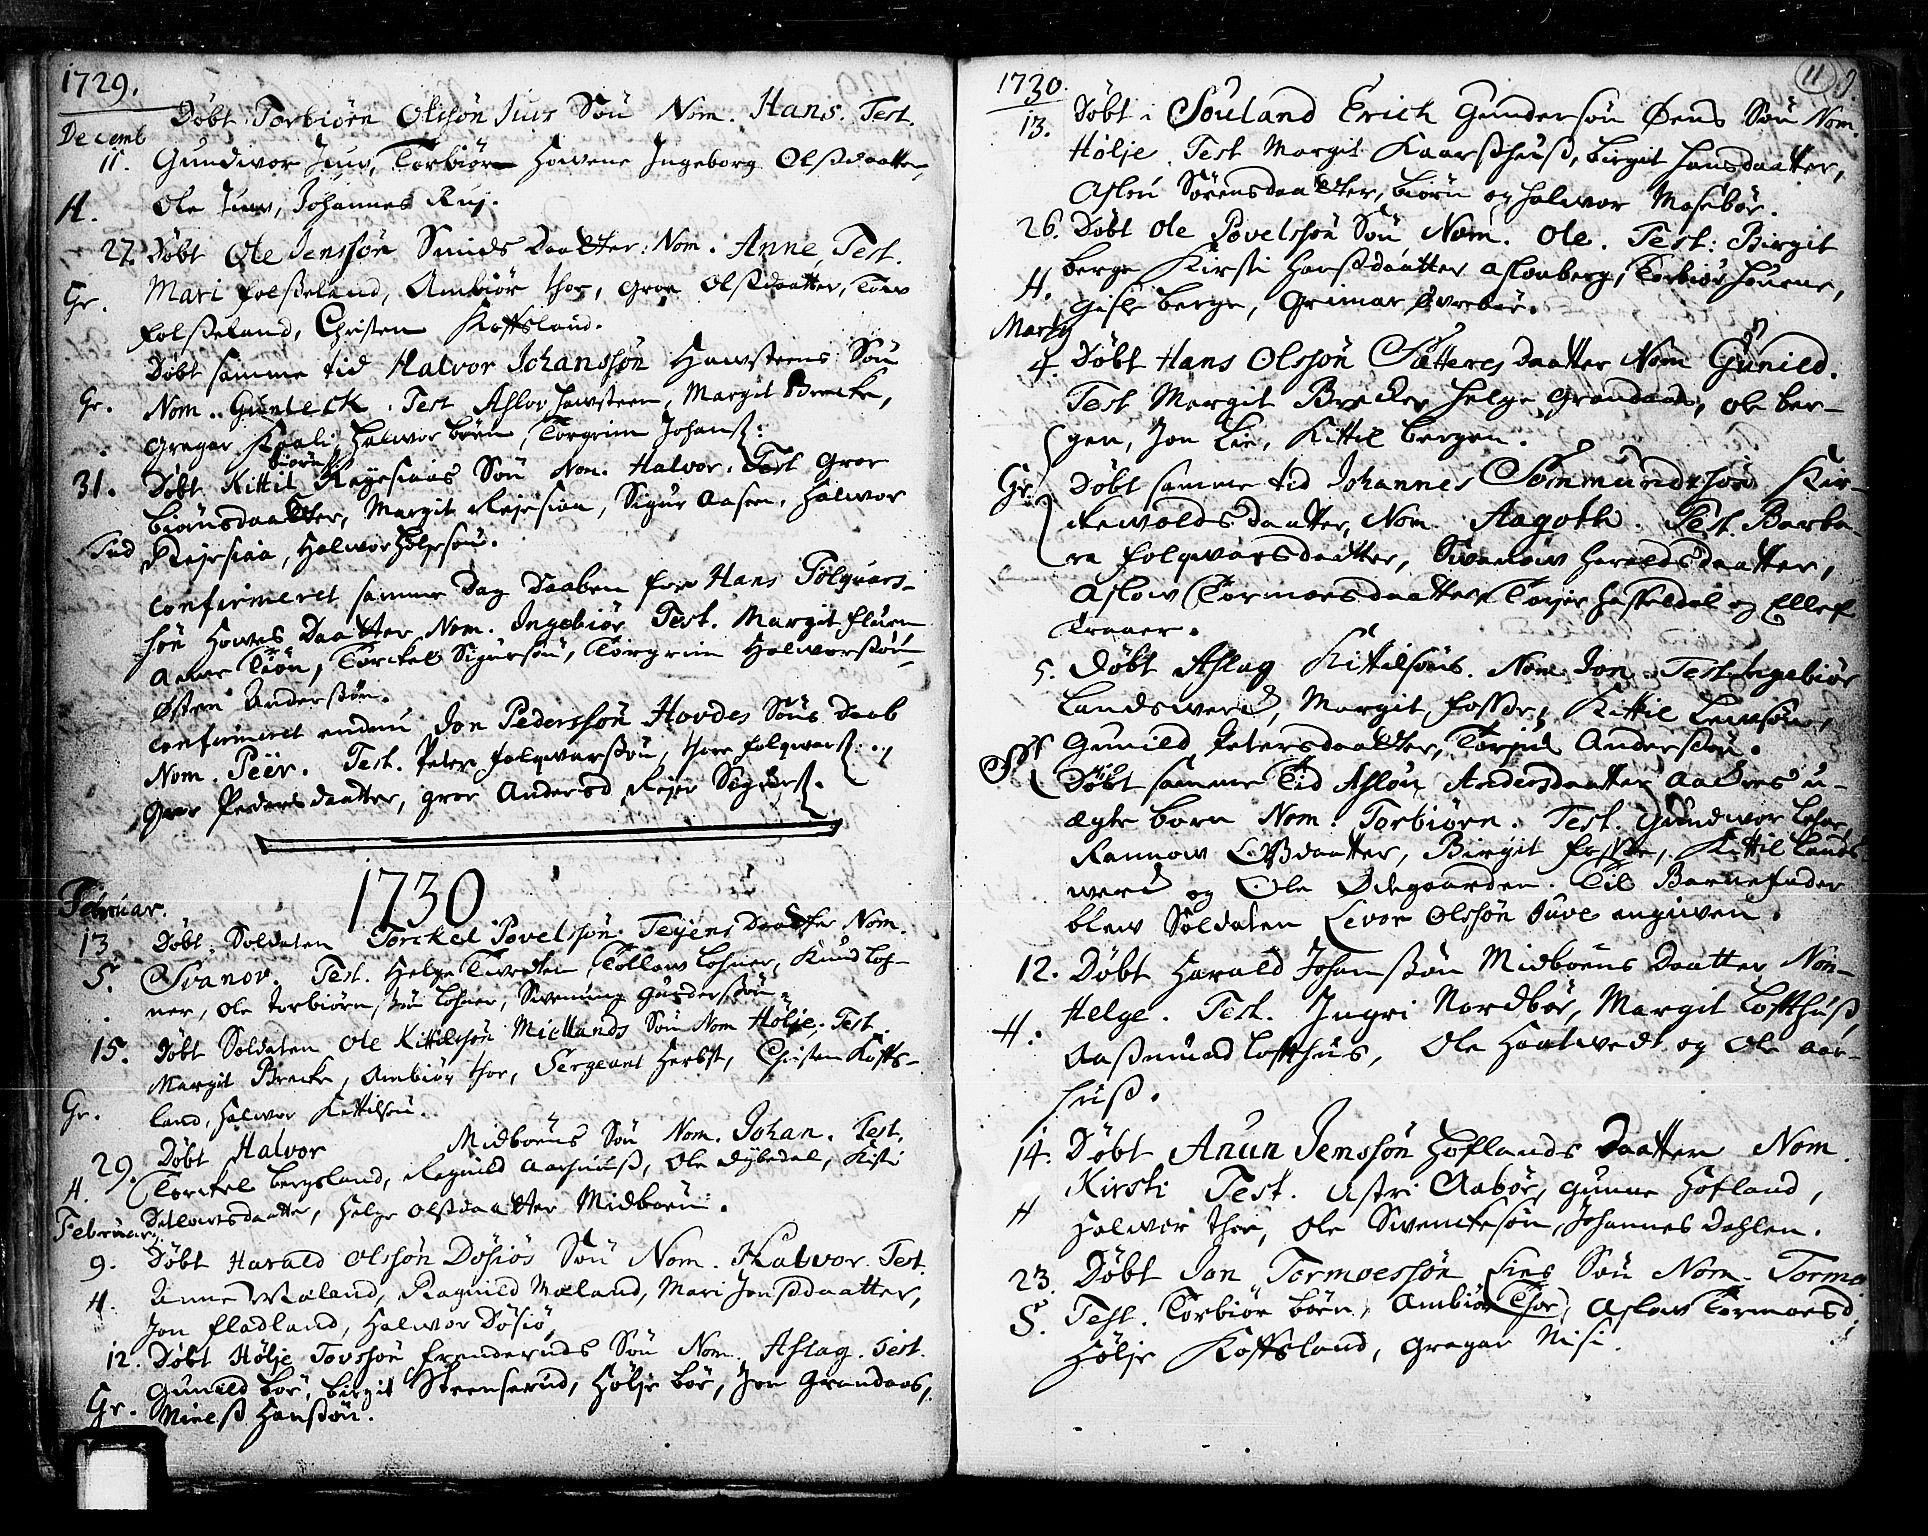 SAKO, Hjartdal kirkebøker, F/Fa/L0003: Ministerialbok nr. I 3, 1727-1775, s. 11